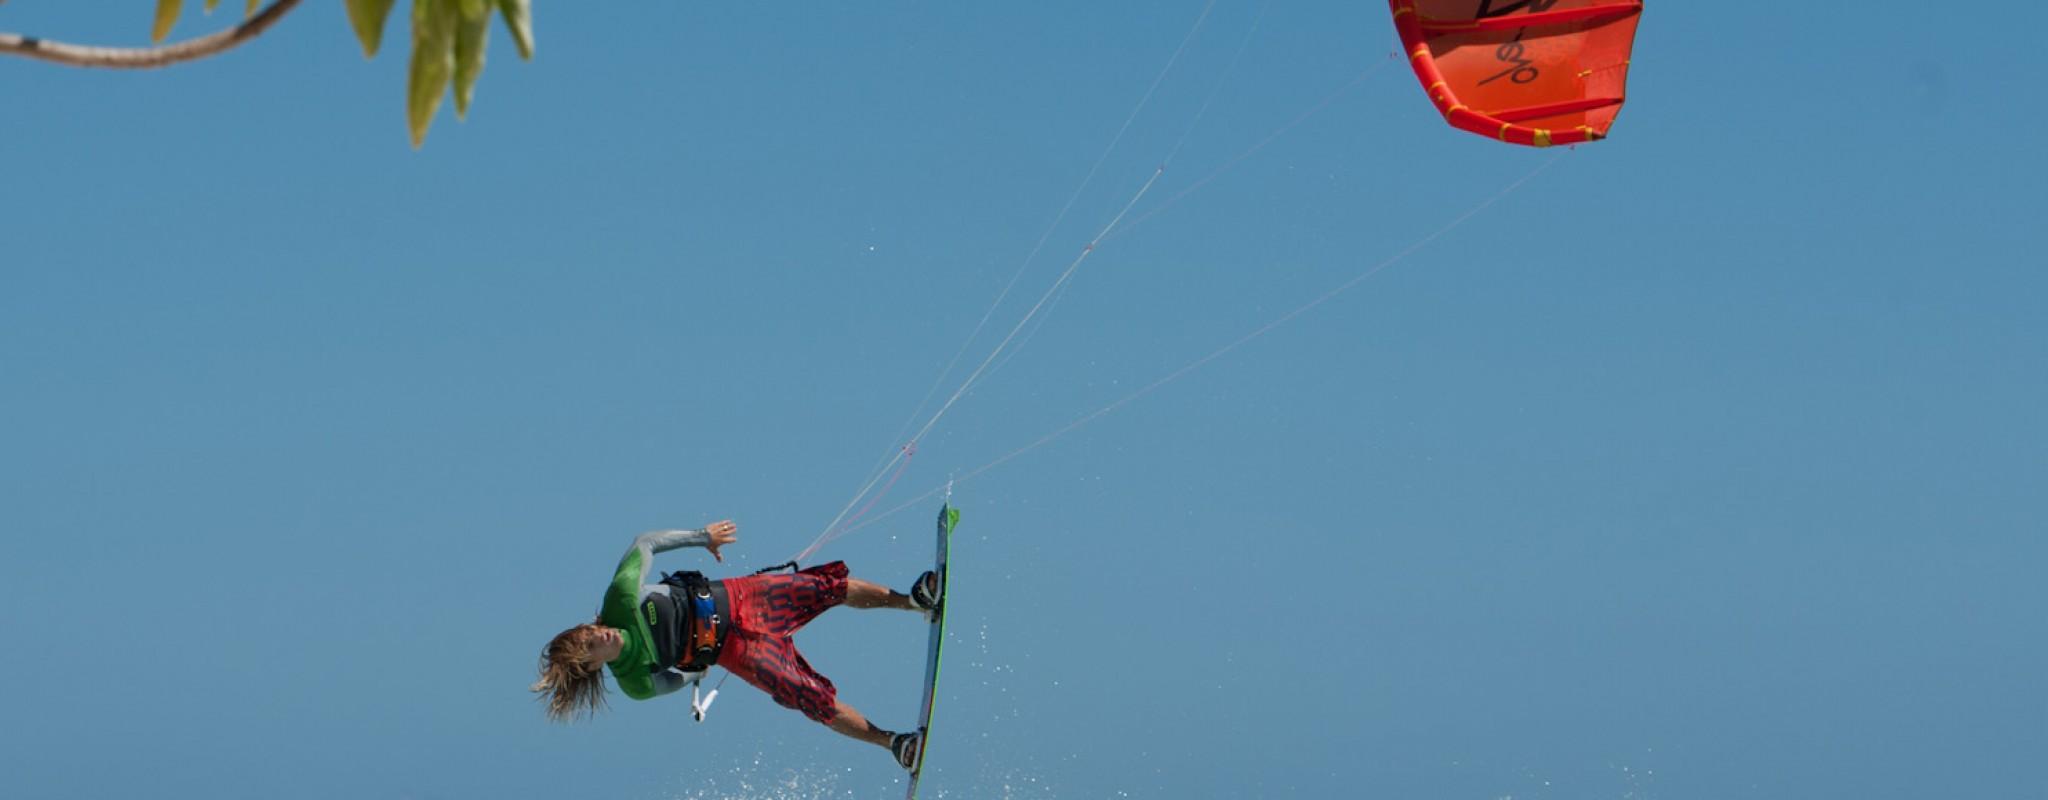 Mundo Kitesurf